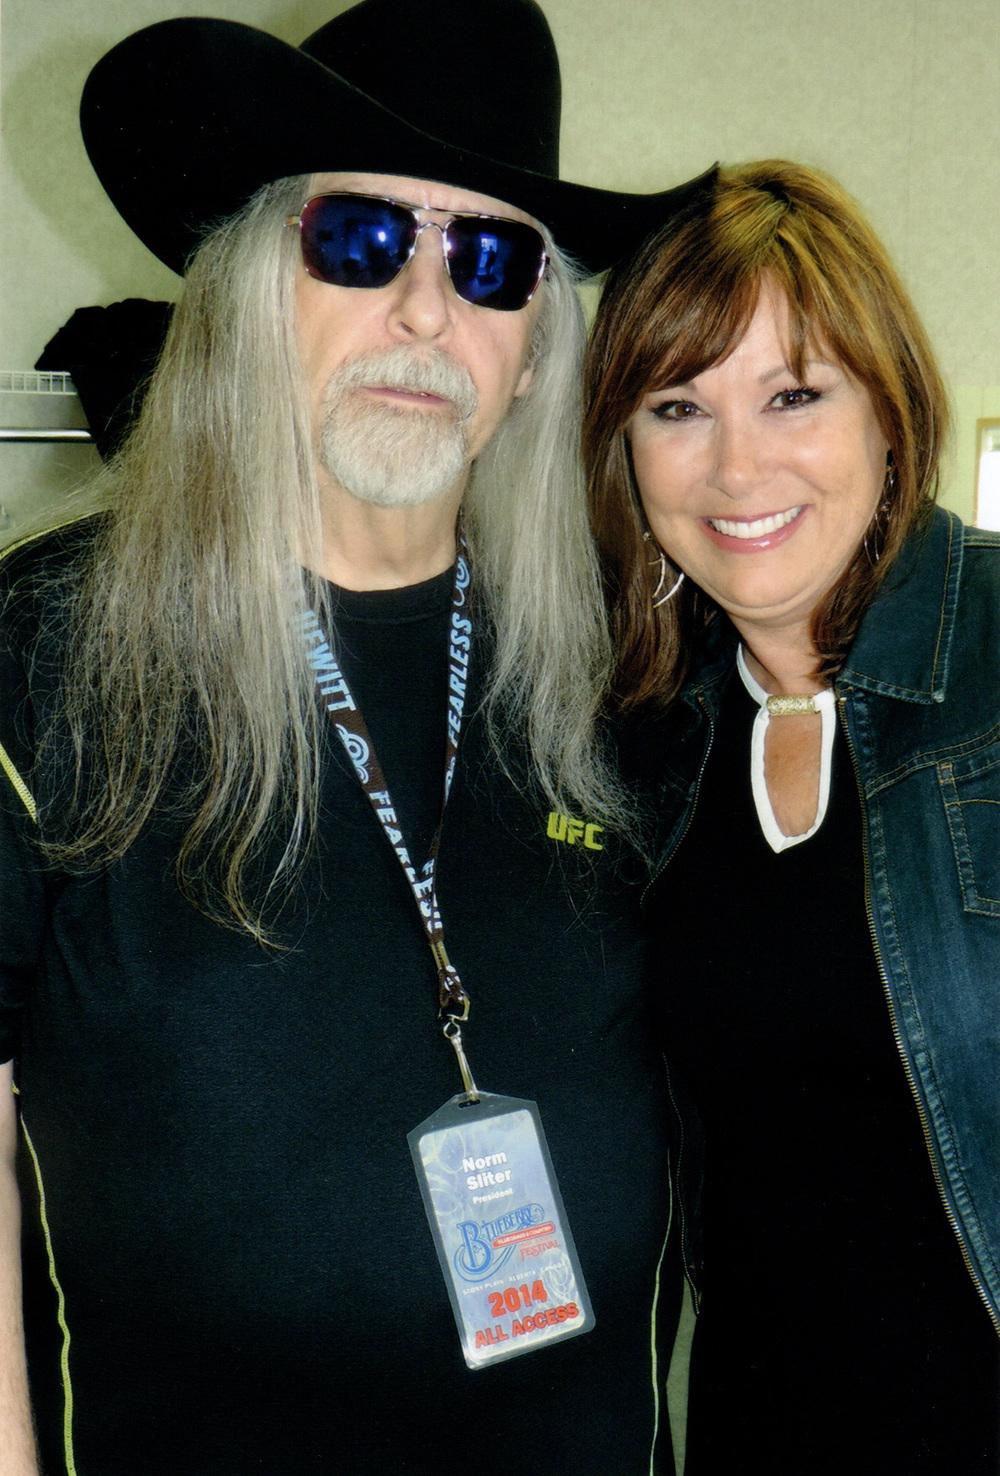 Norm Sliter (Blueberry President) & Suzy Bogguss